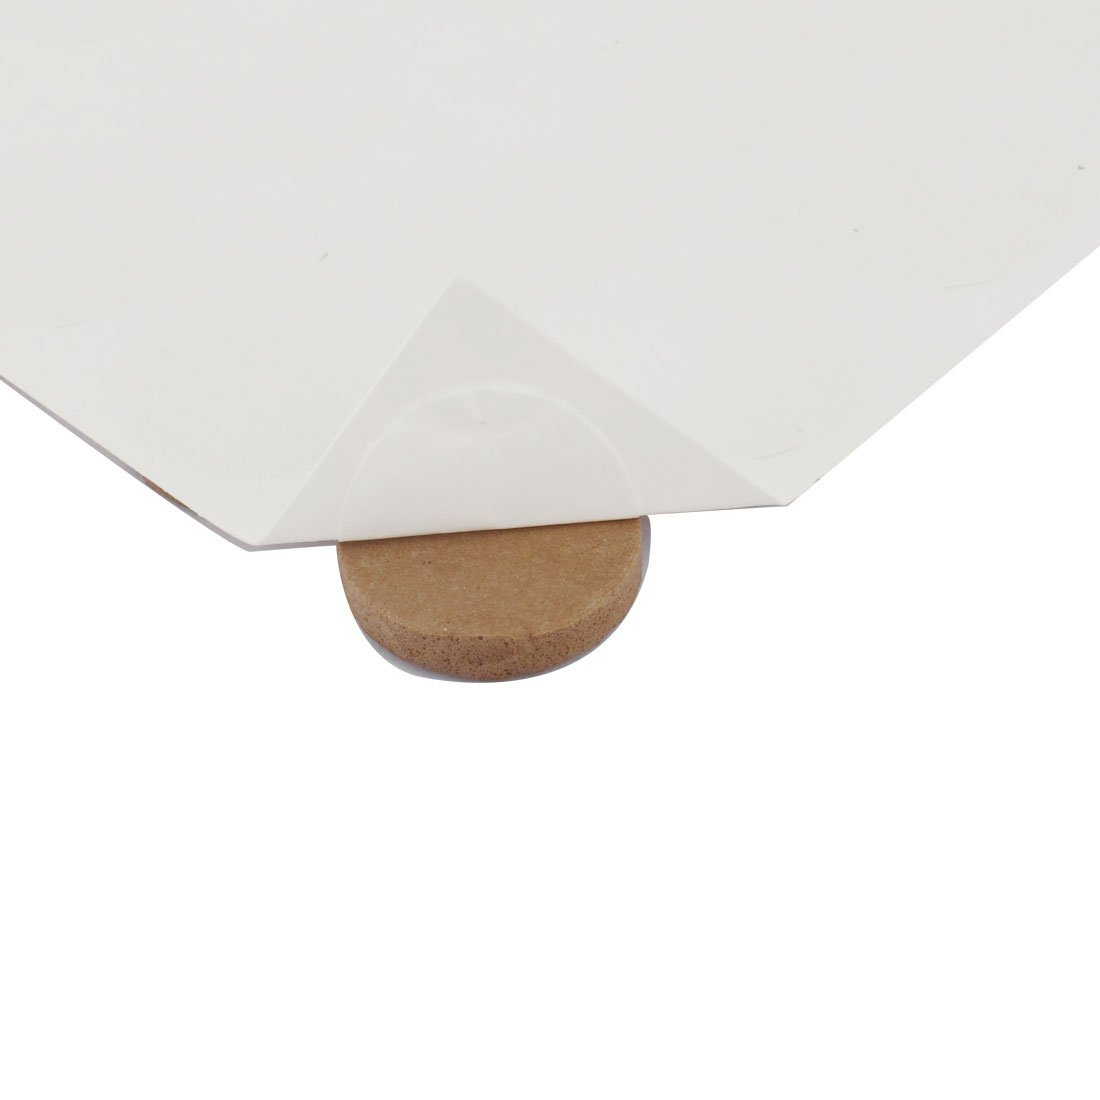 eDealMax EVA Table Ronde Chaise Anti-rayures Meubles Pieds Tapis housses de Coussin 18mm Dia Brown